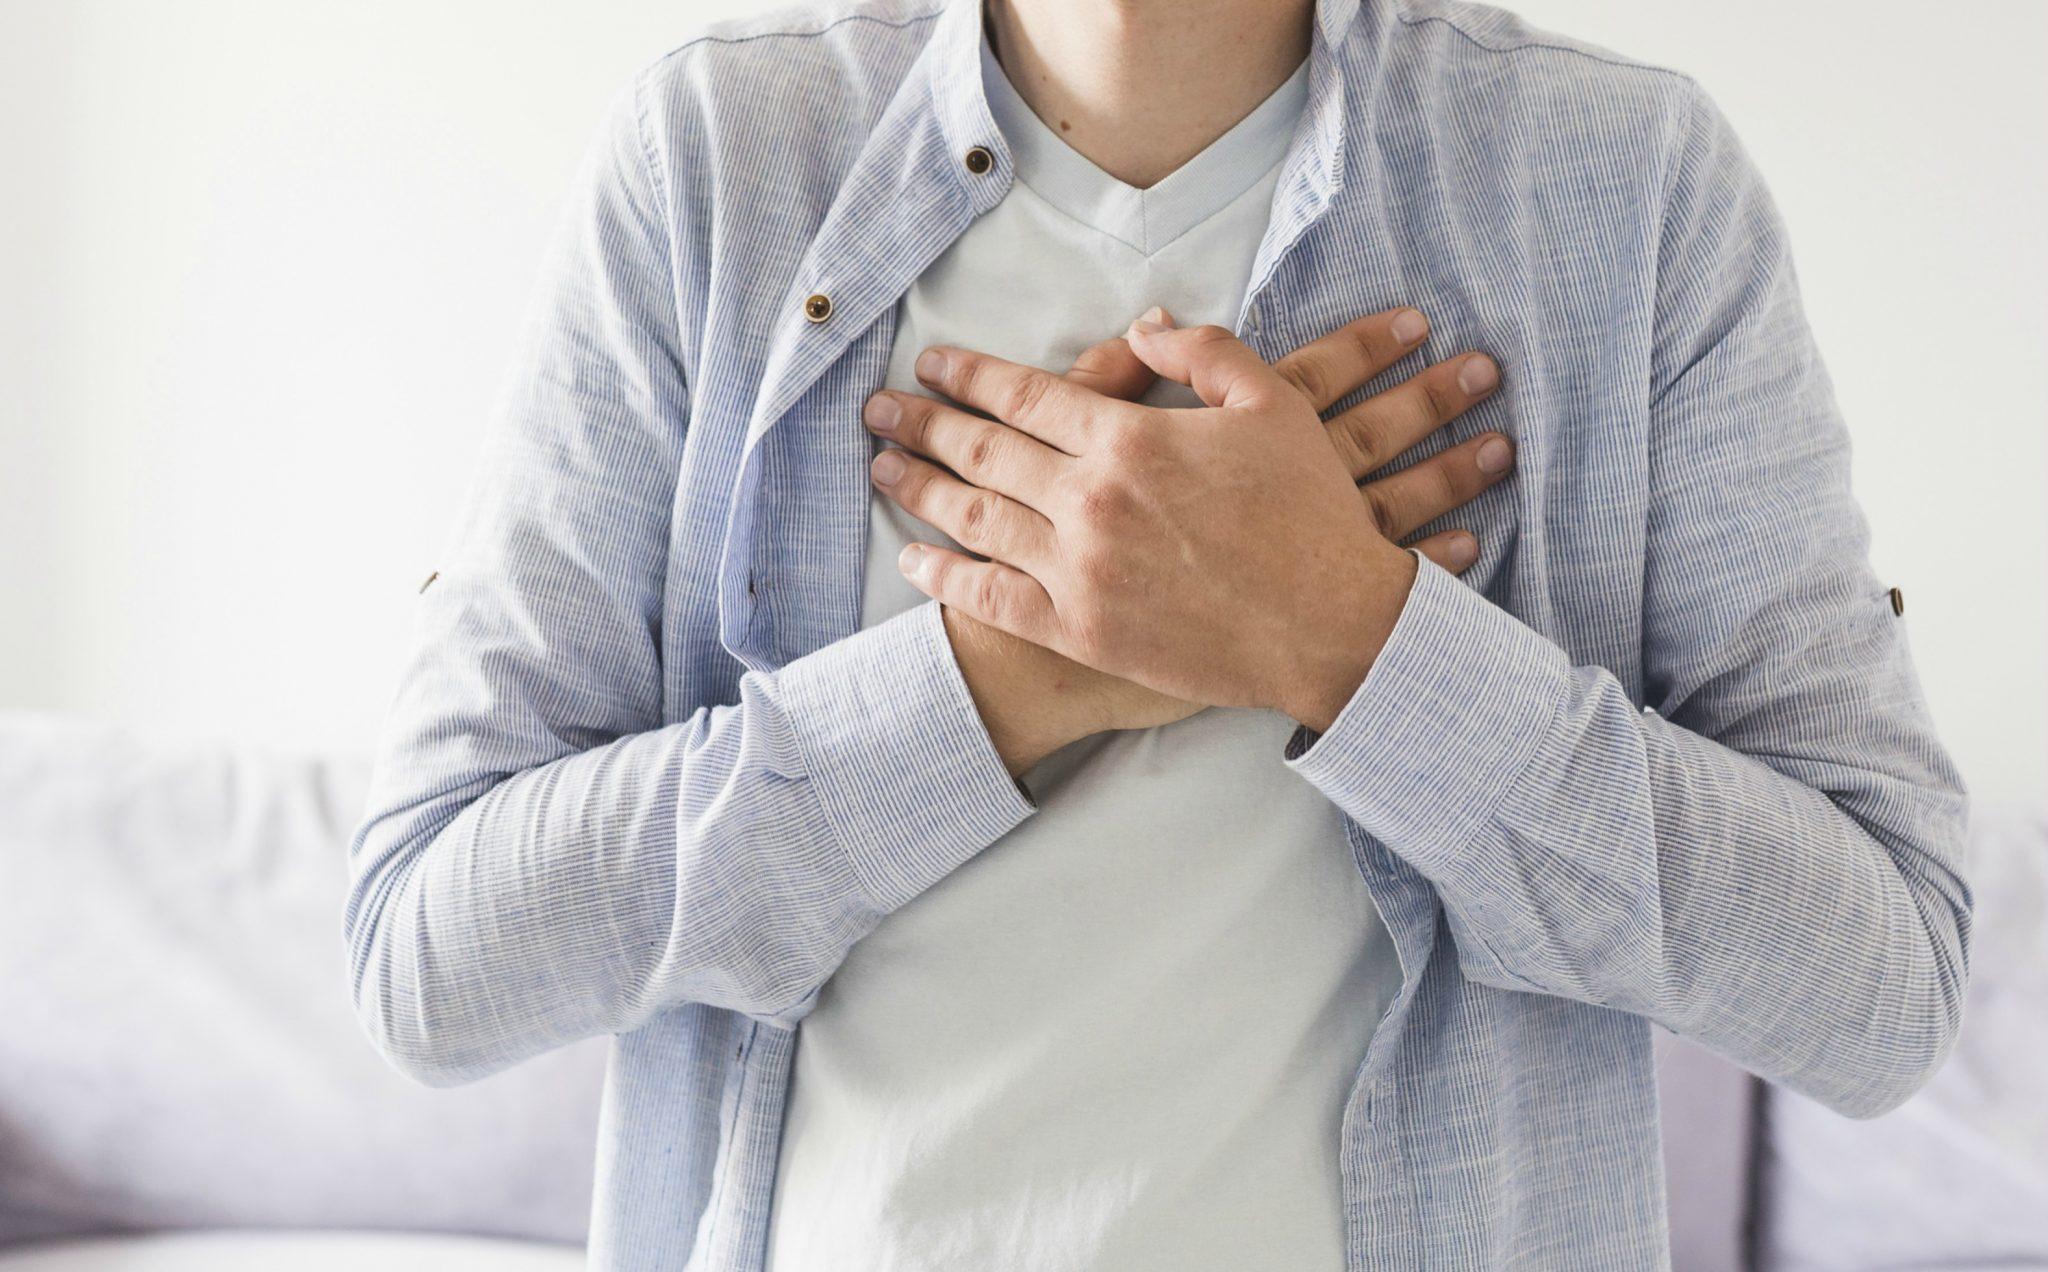 Vyndaqel auxilia no tratamento da cardiomiopatia